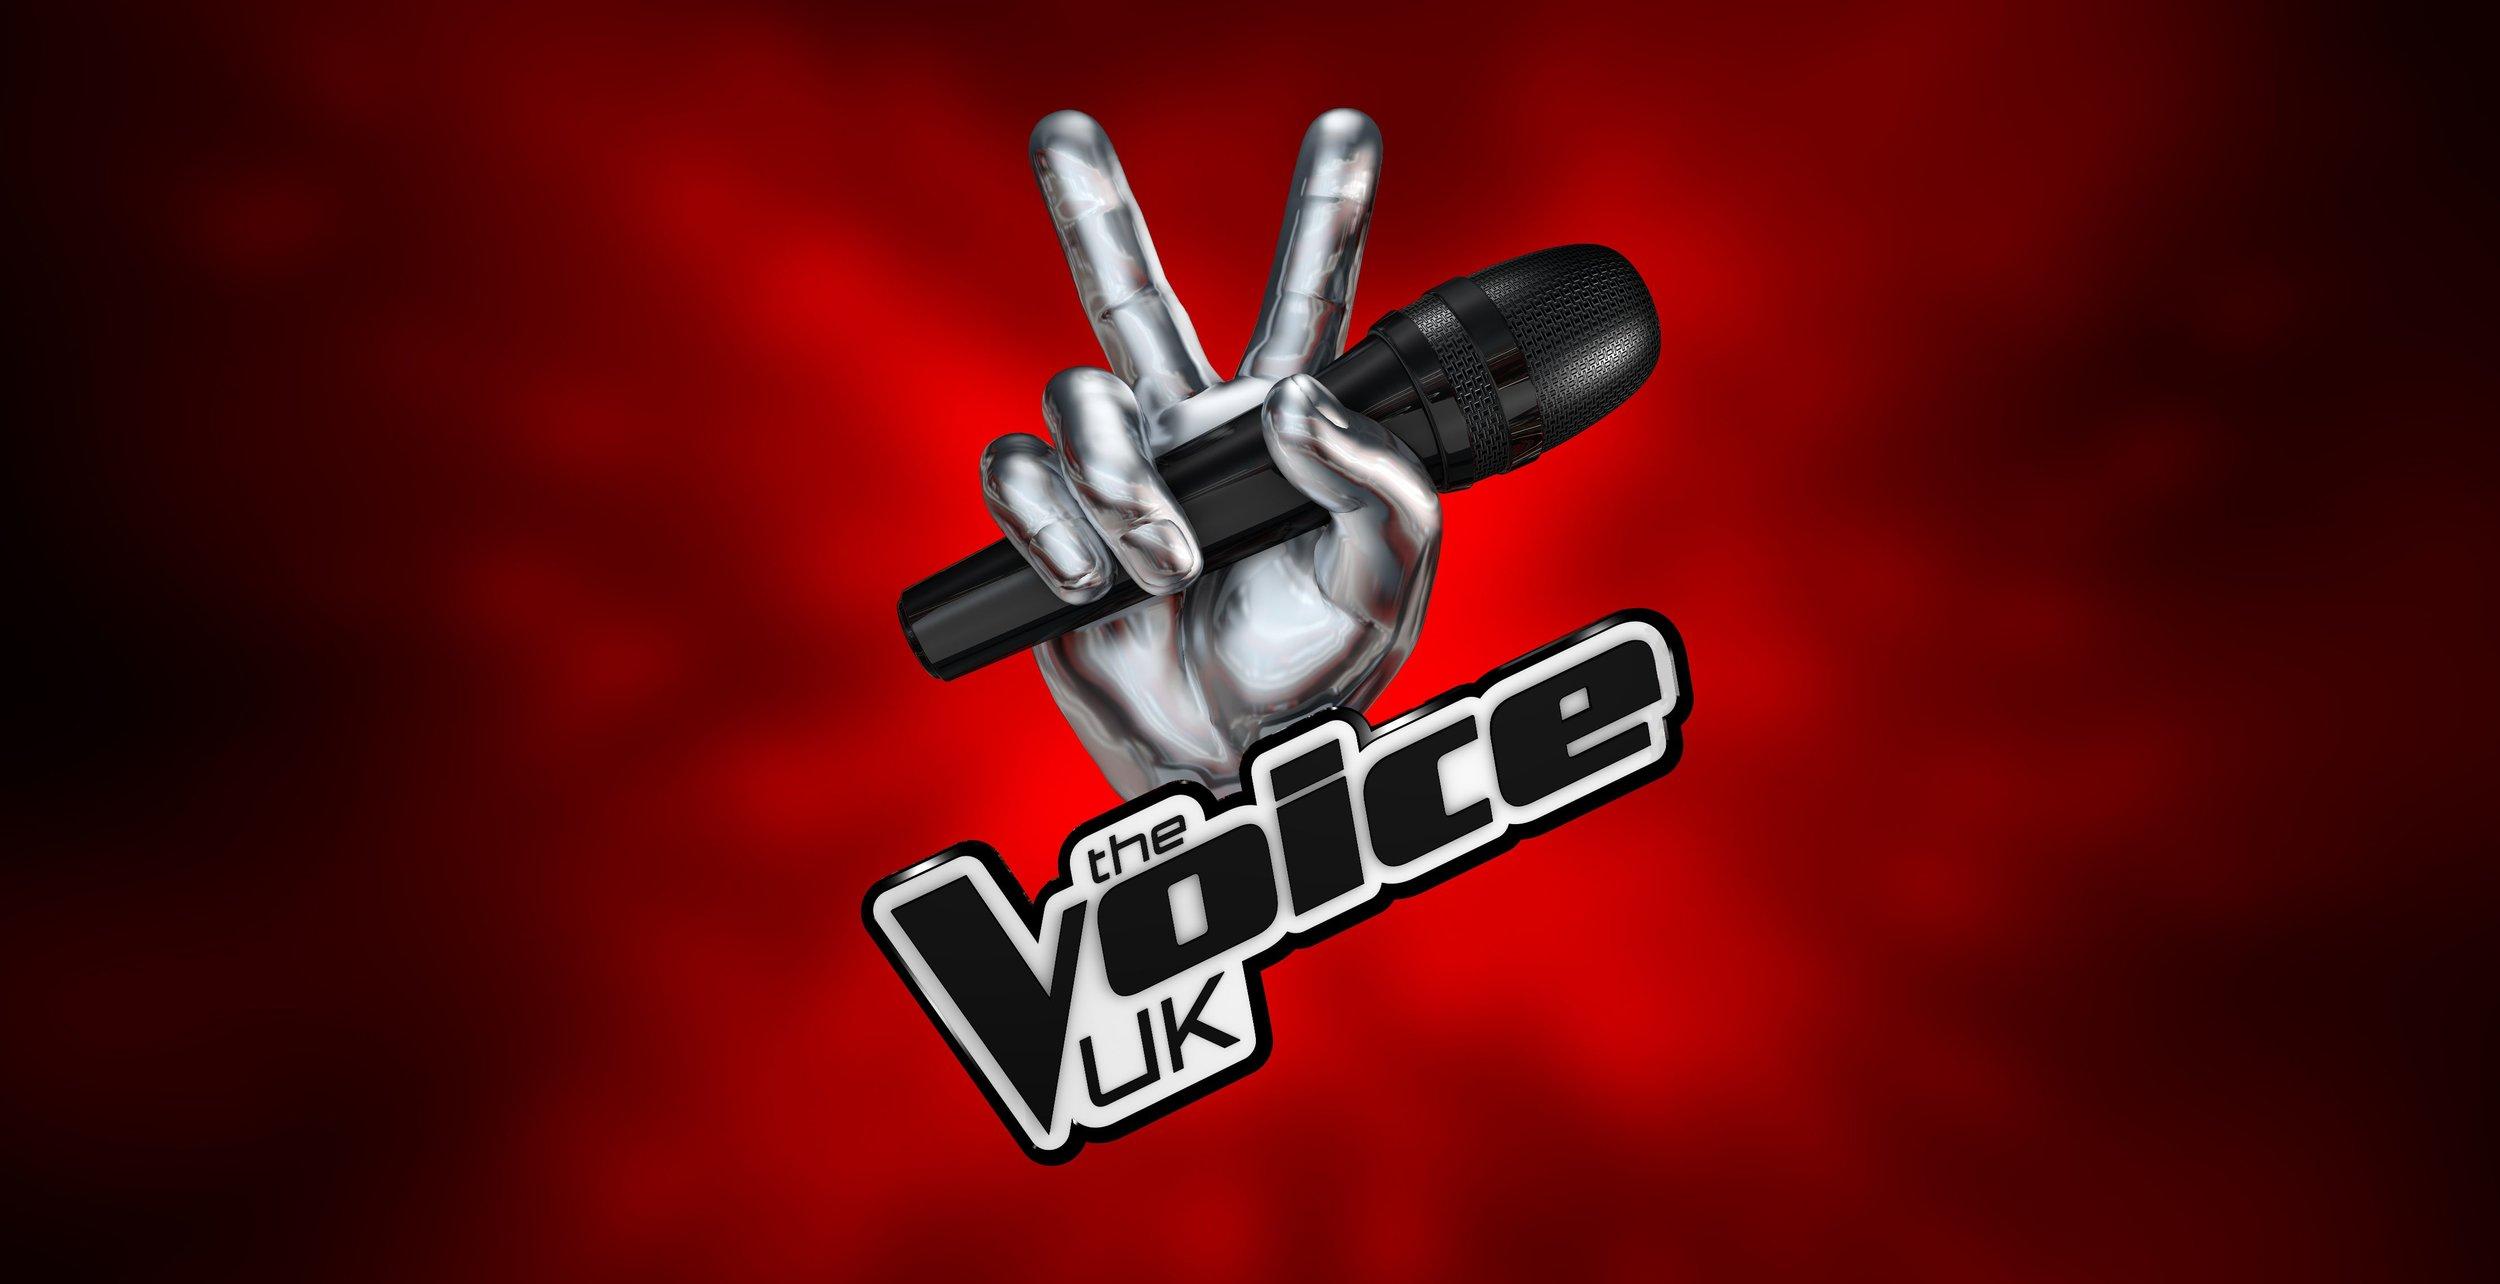 the-voice-uk-logo.jpg